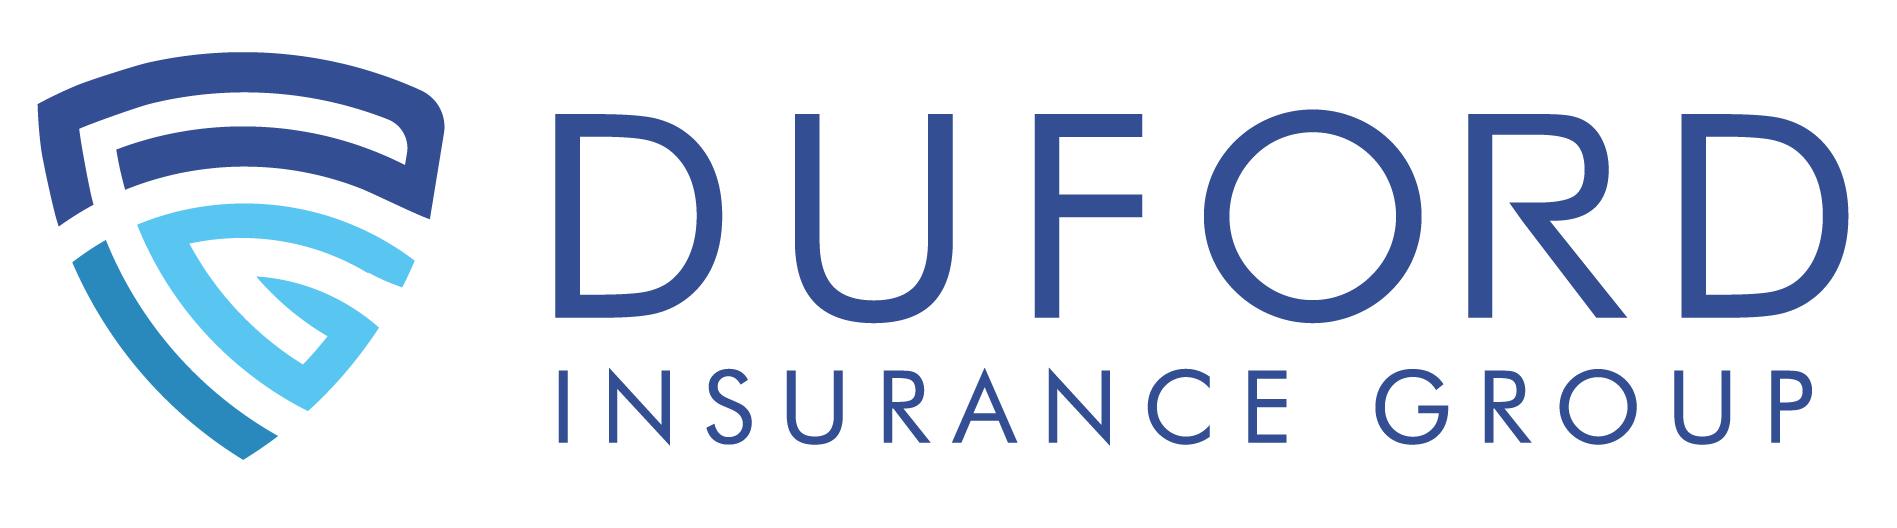 Duford Insurance Group